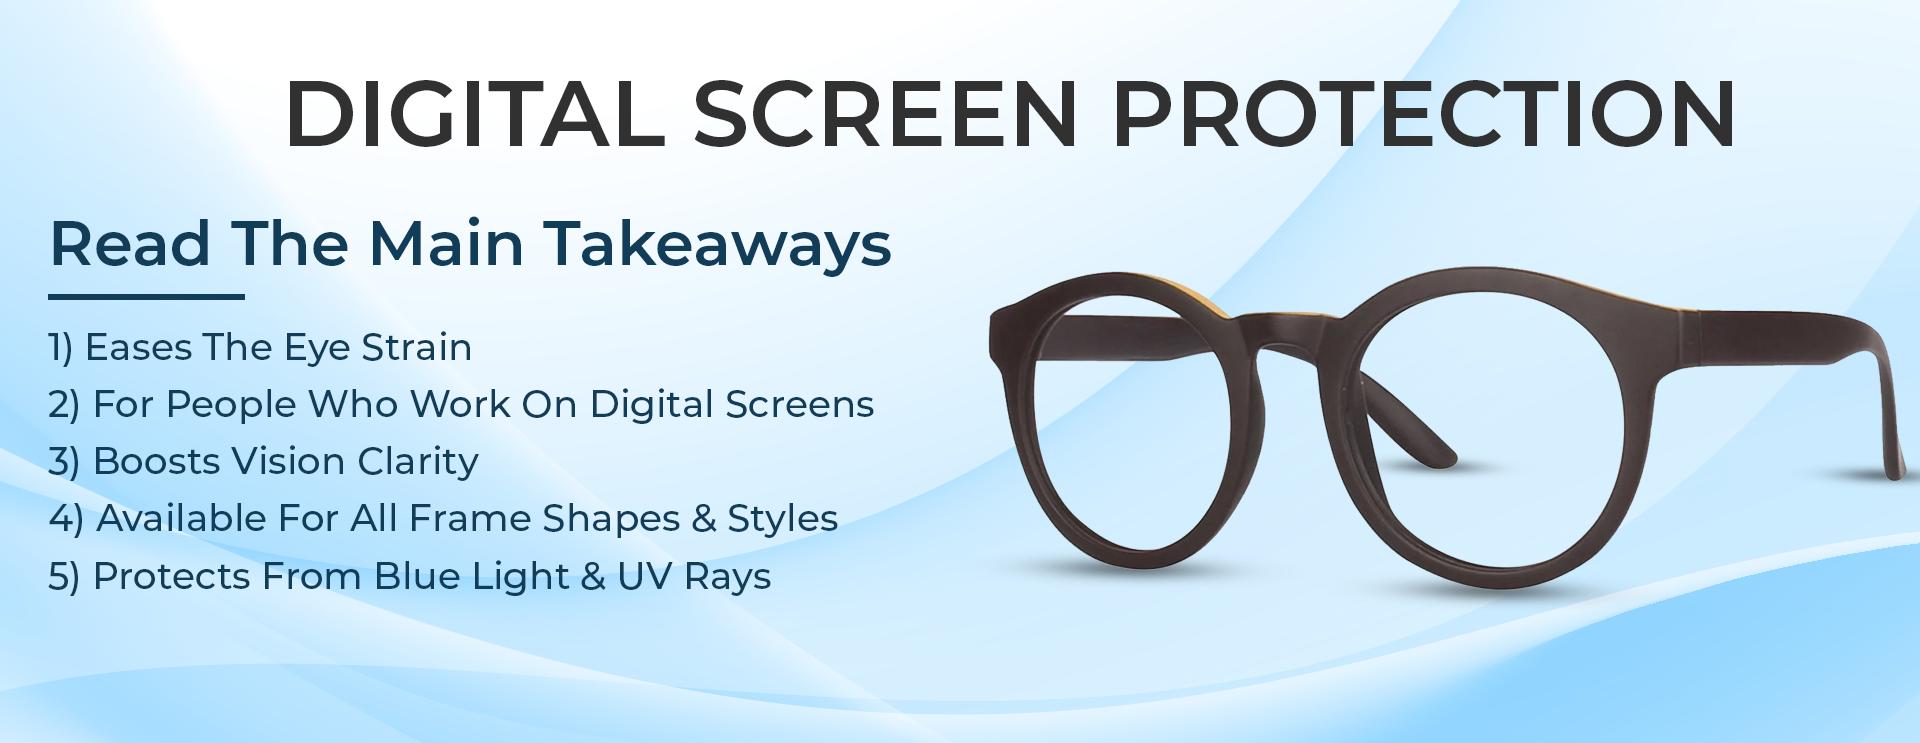 Digital Screen Protection - The Main Takeaways